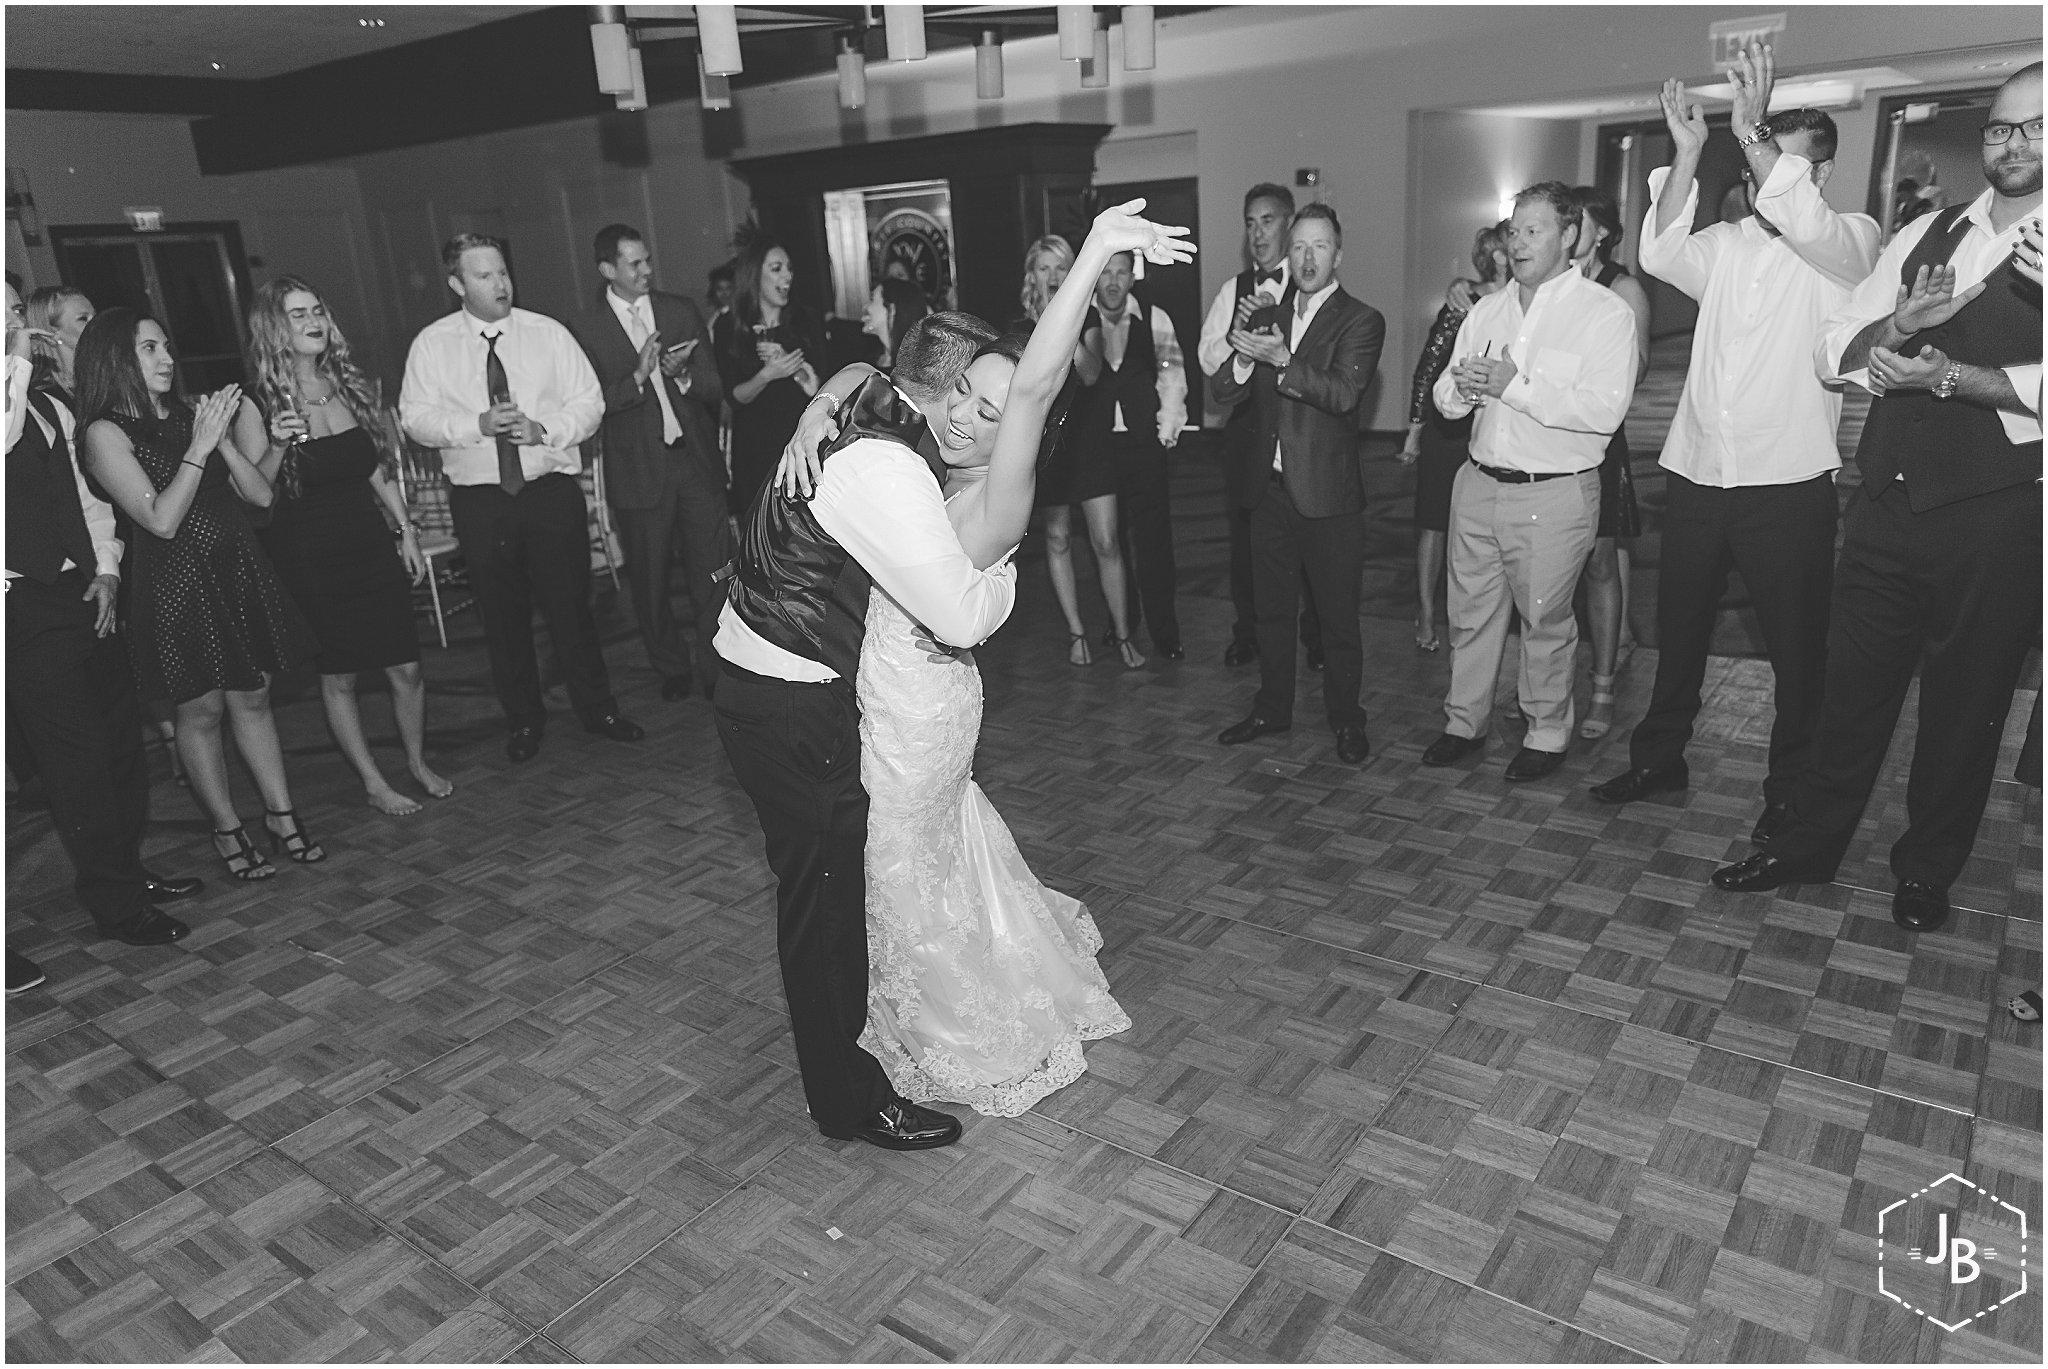 WeddingandEngagementFloridaPhotographer_0285.jpg